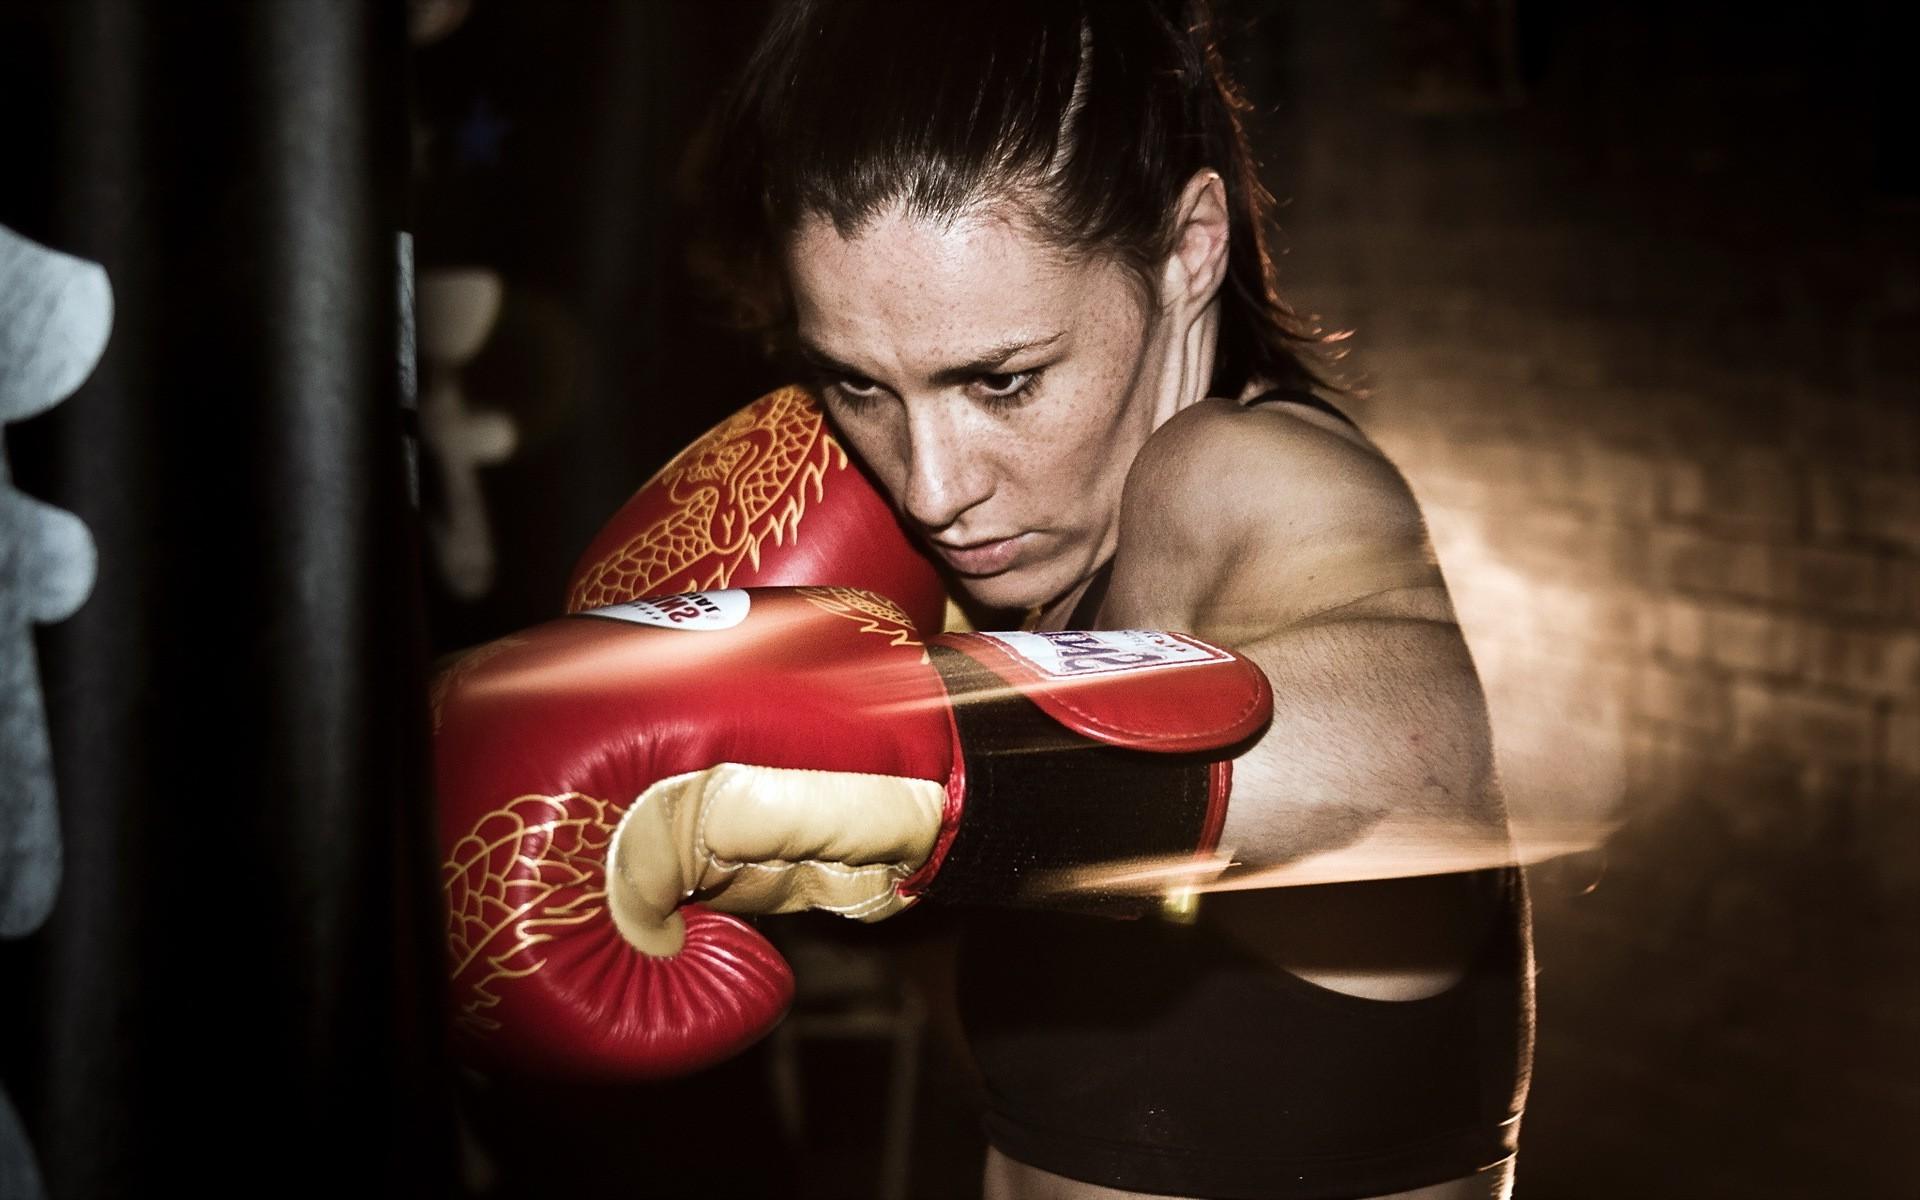 Free Download Girl Wallpaper For 360x640 Wallpaper Women Model Red Boxing Kickboxing Woman